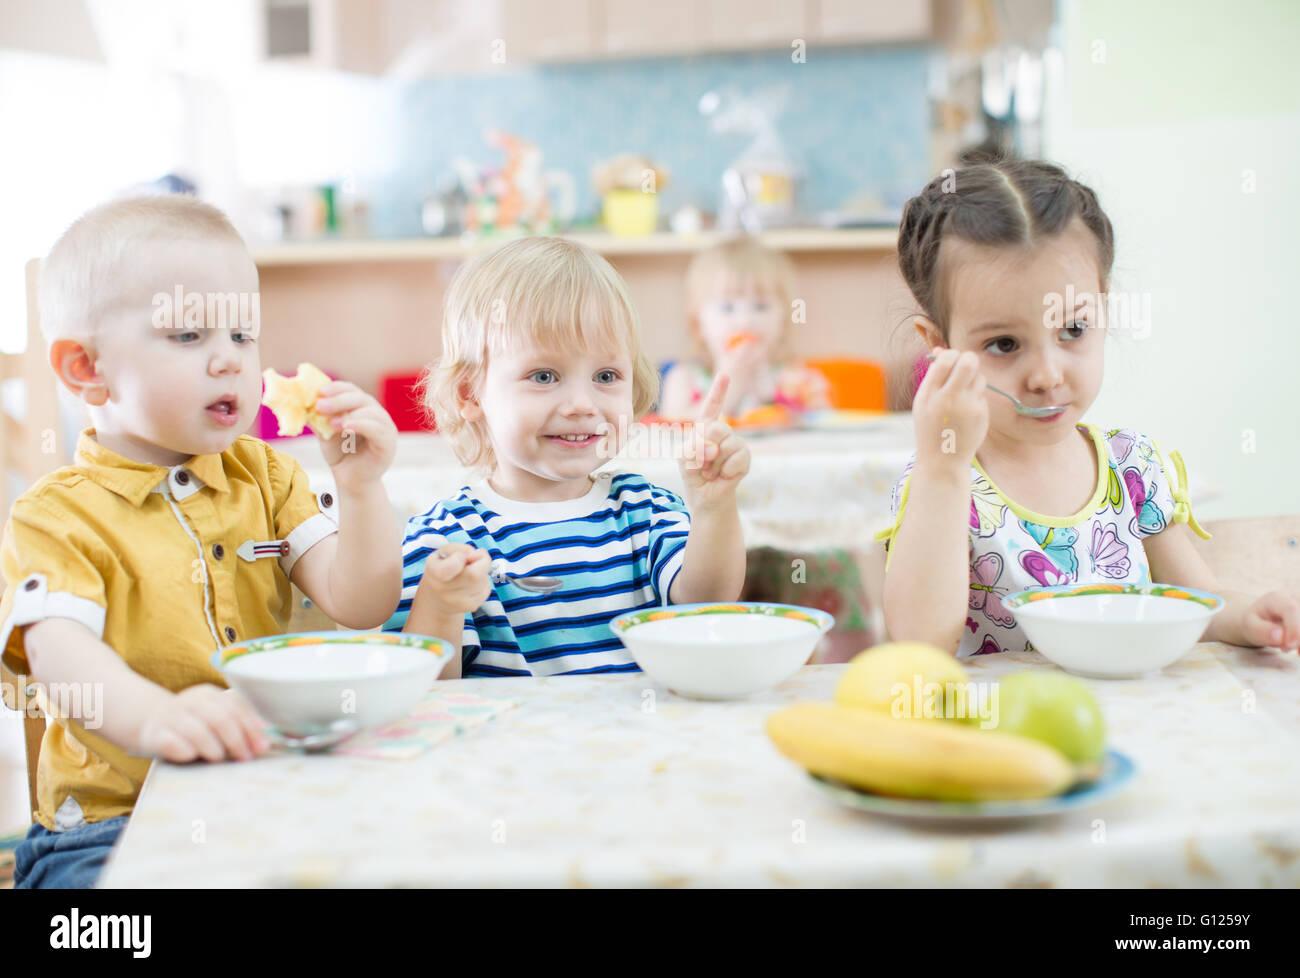 Lustige Kinder Essen im kindergarten Stockfoto, Bild: 103924967 - Alamy